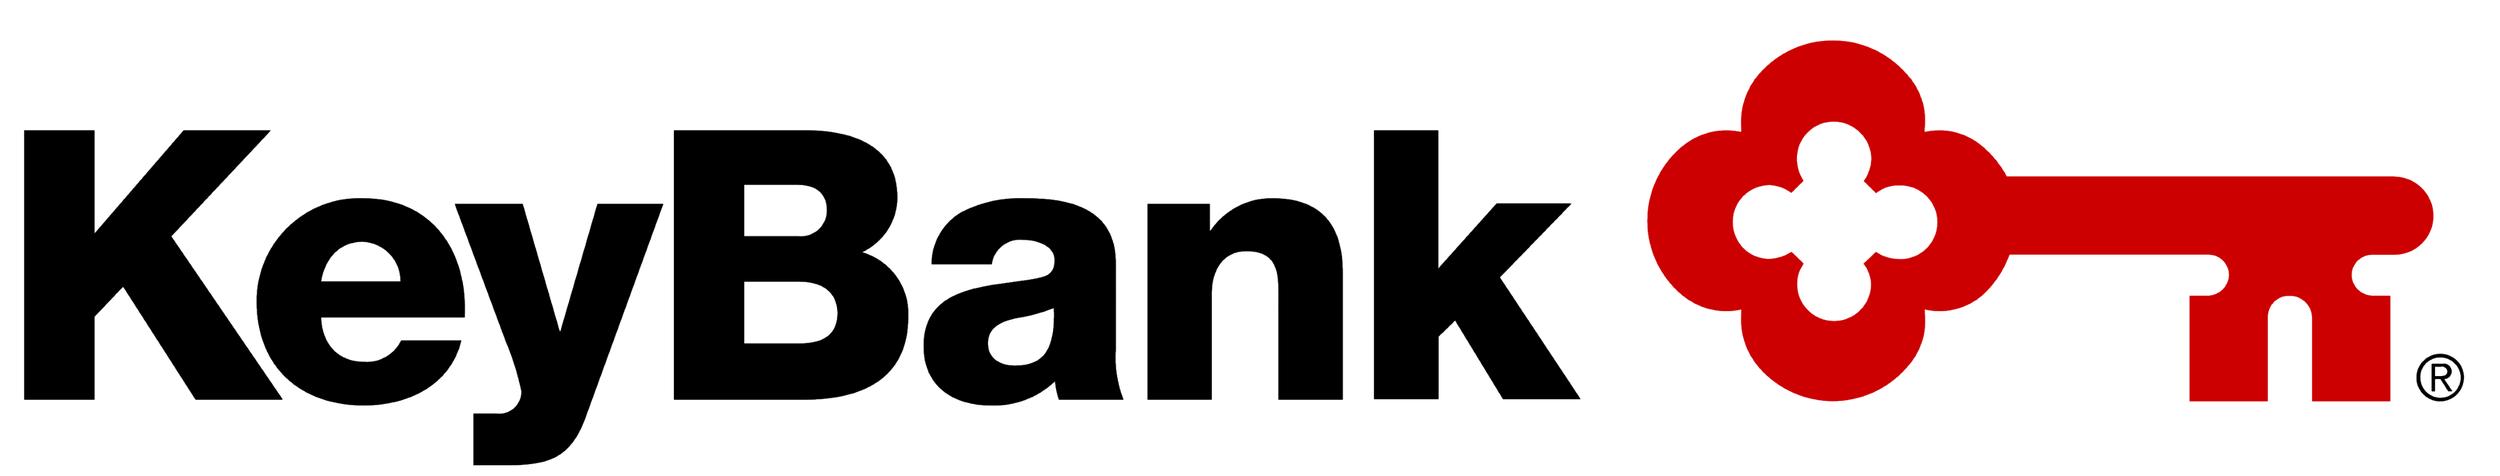 KeyBank_logo.png